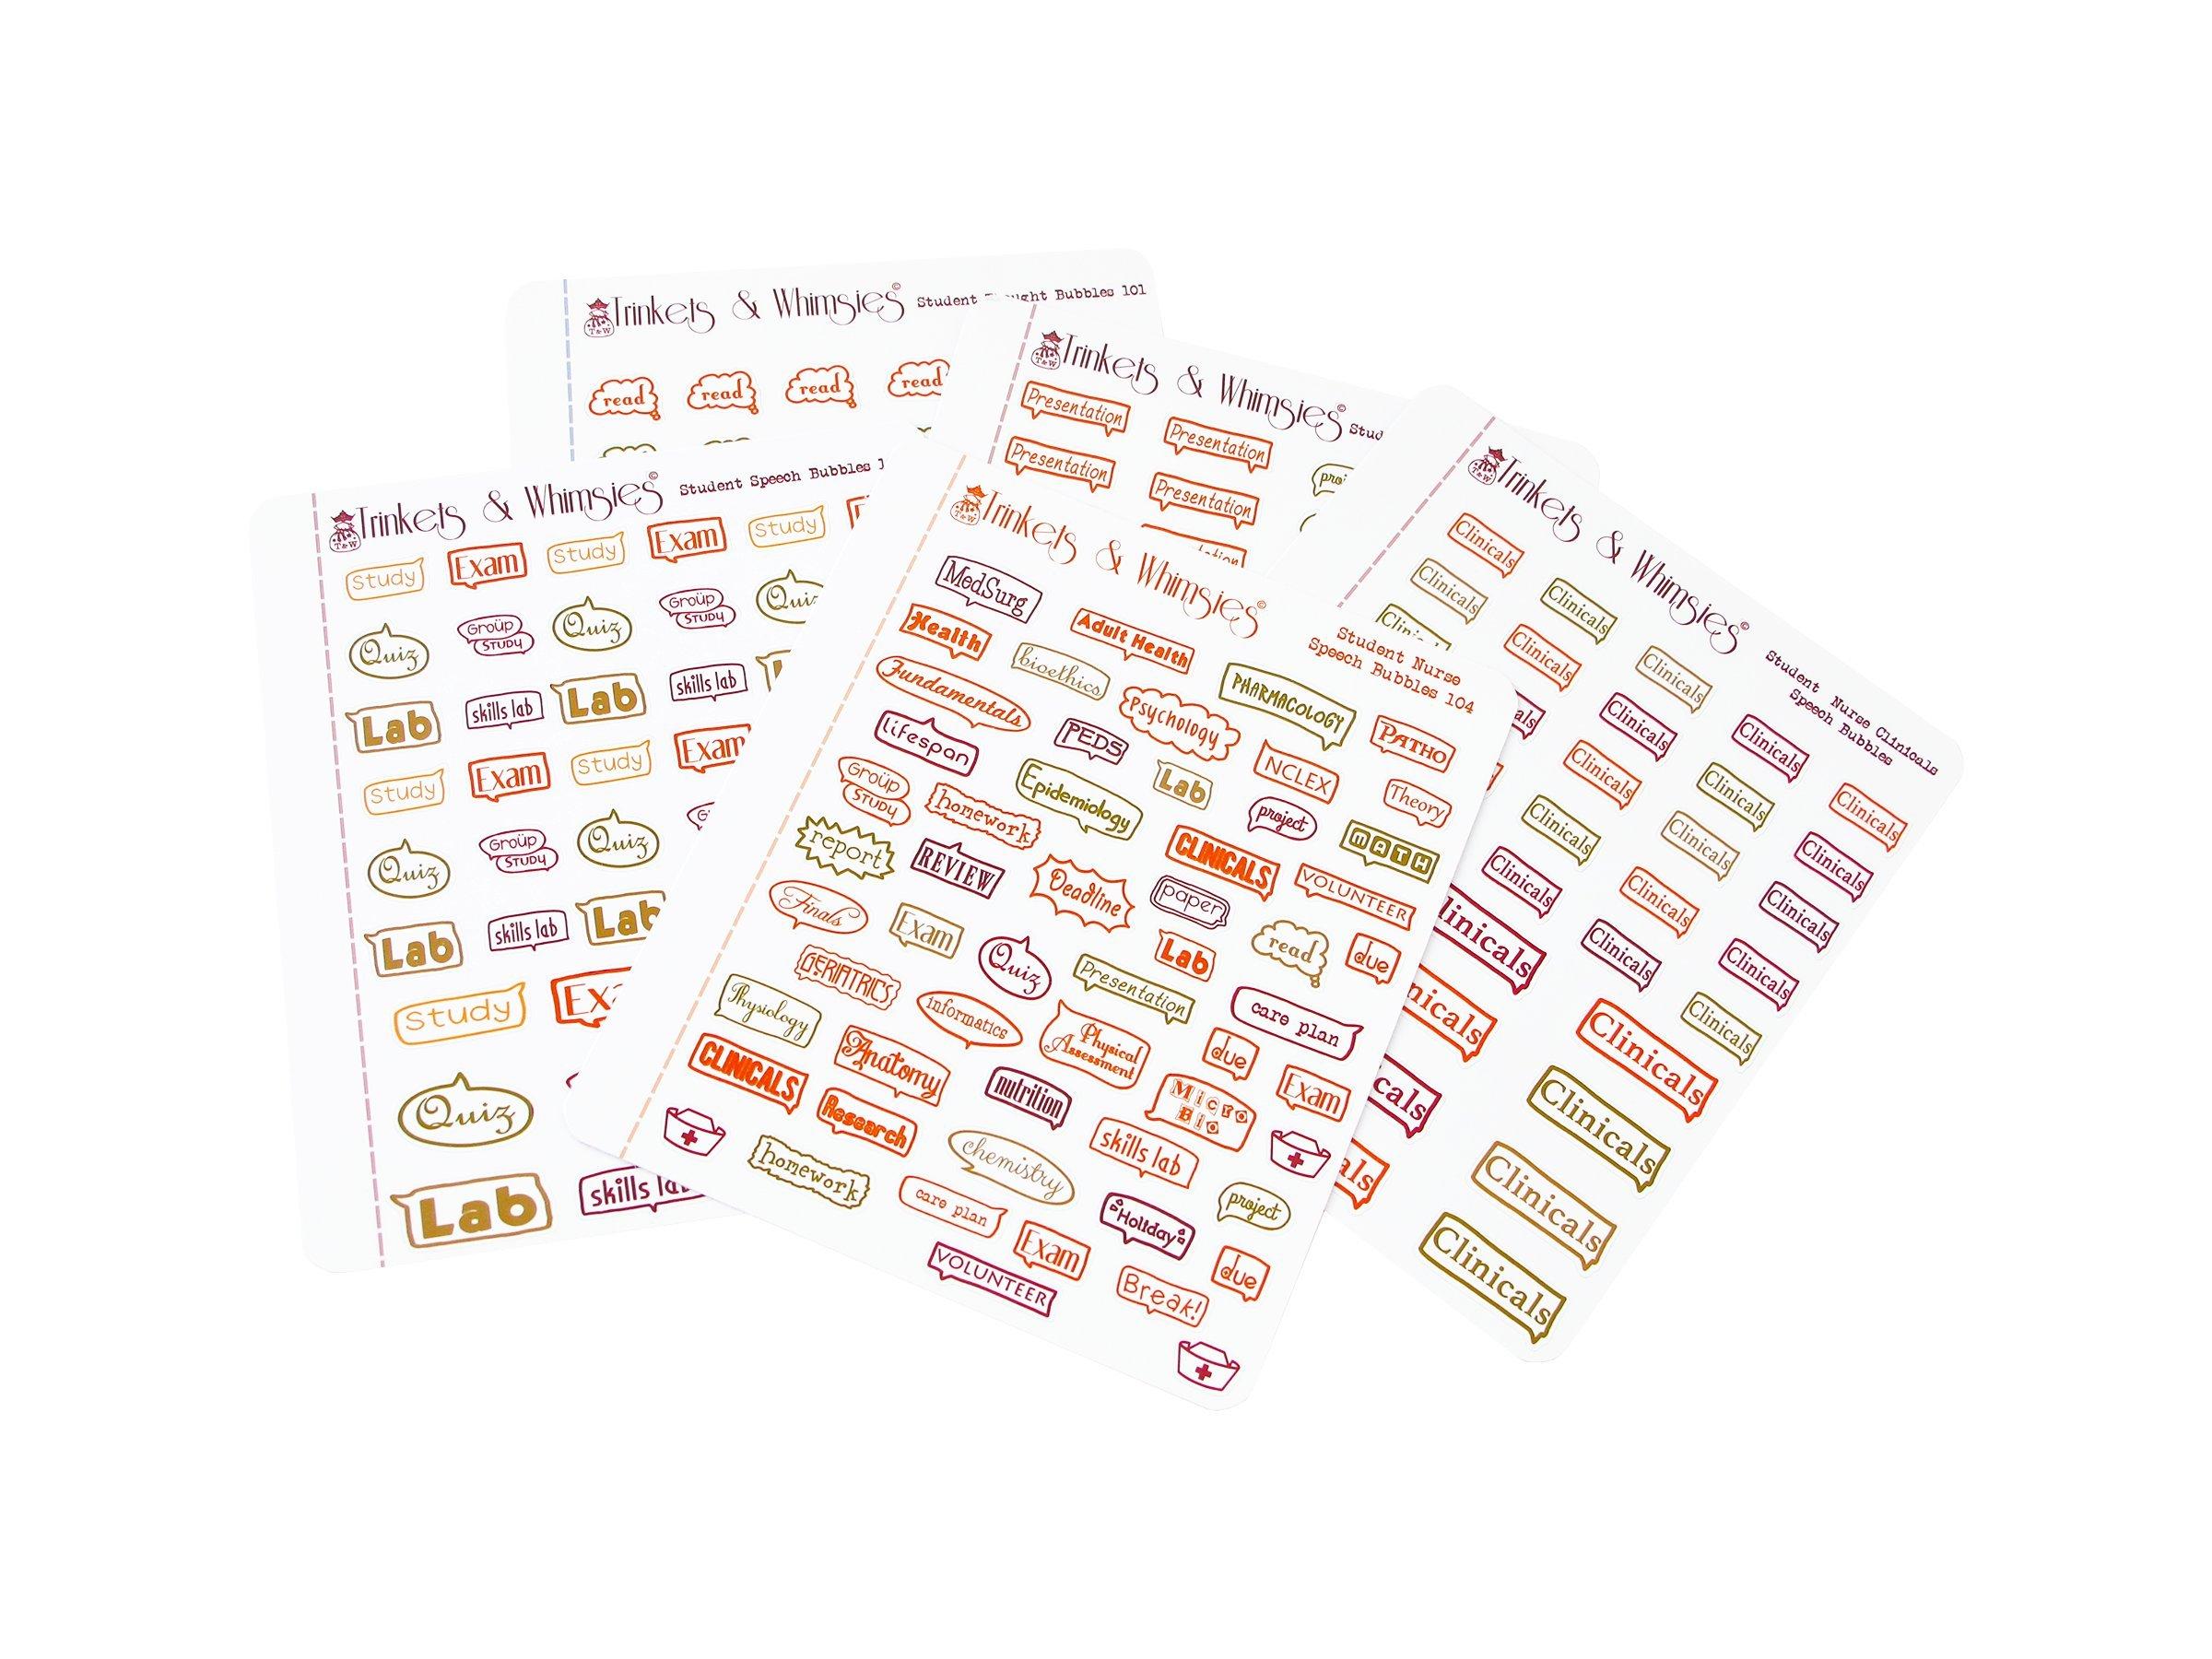 Nursing School   Student Nurse   Future RN   Future Nurse   Personal Planner Stickers   Planner Accessory (Fall Colors_Glossy)